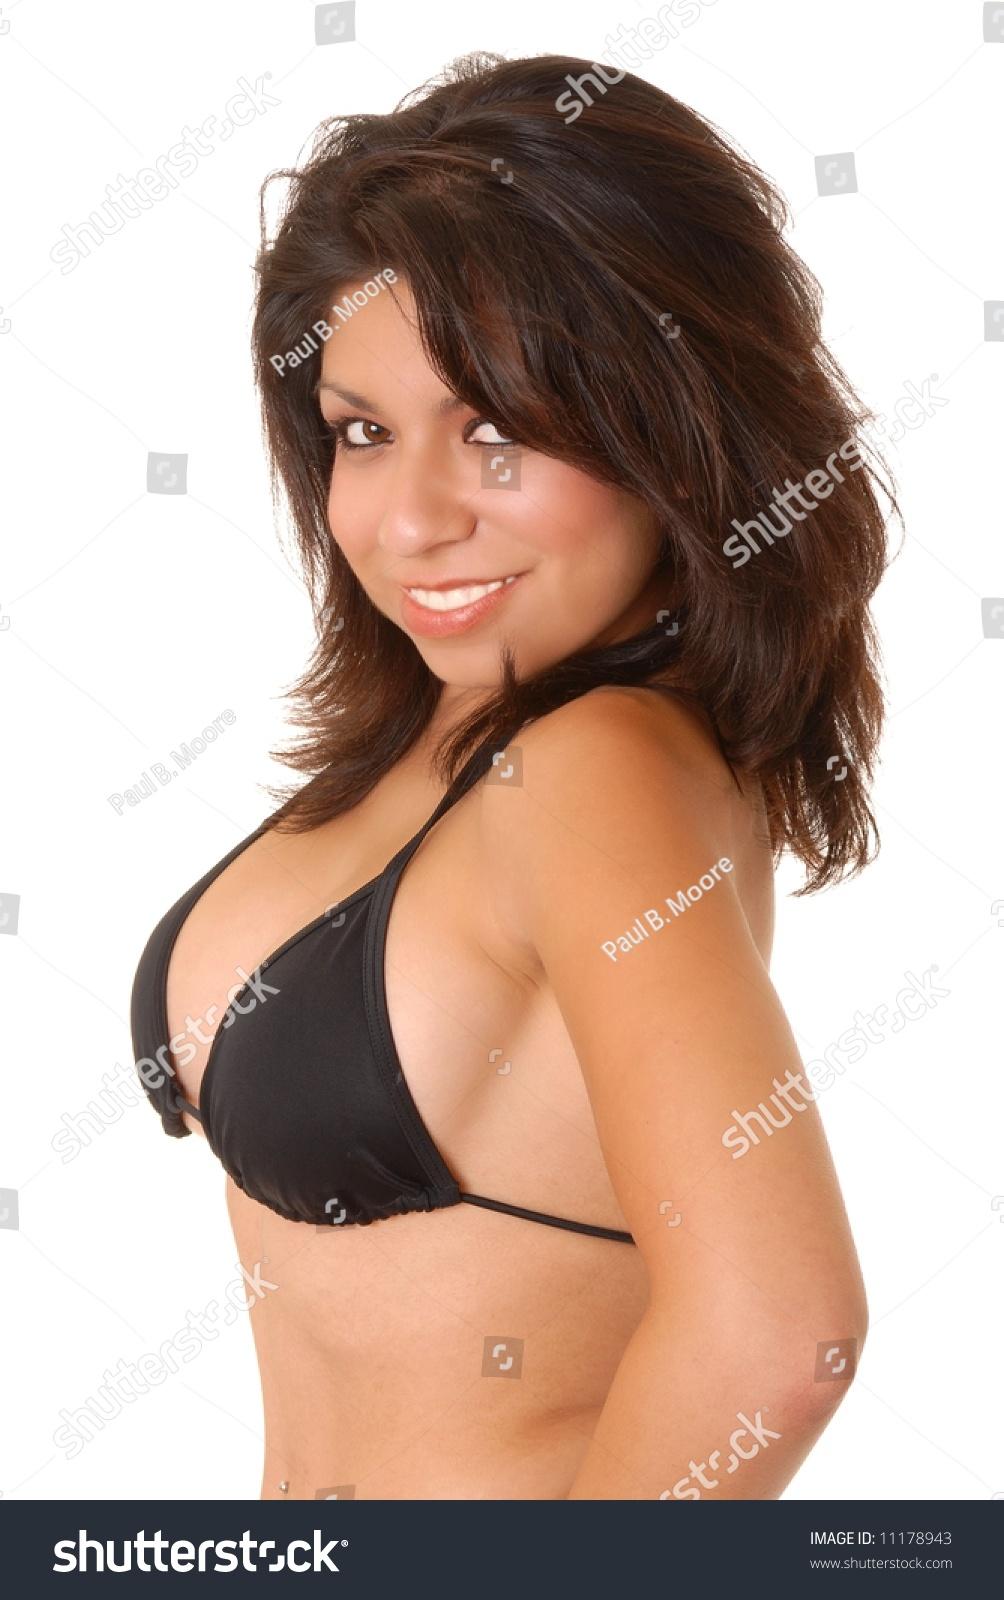 Isolated image of sexy latina girl in bikini on white